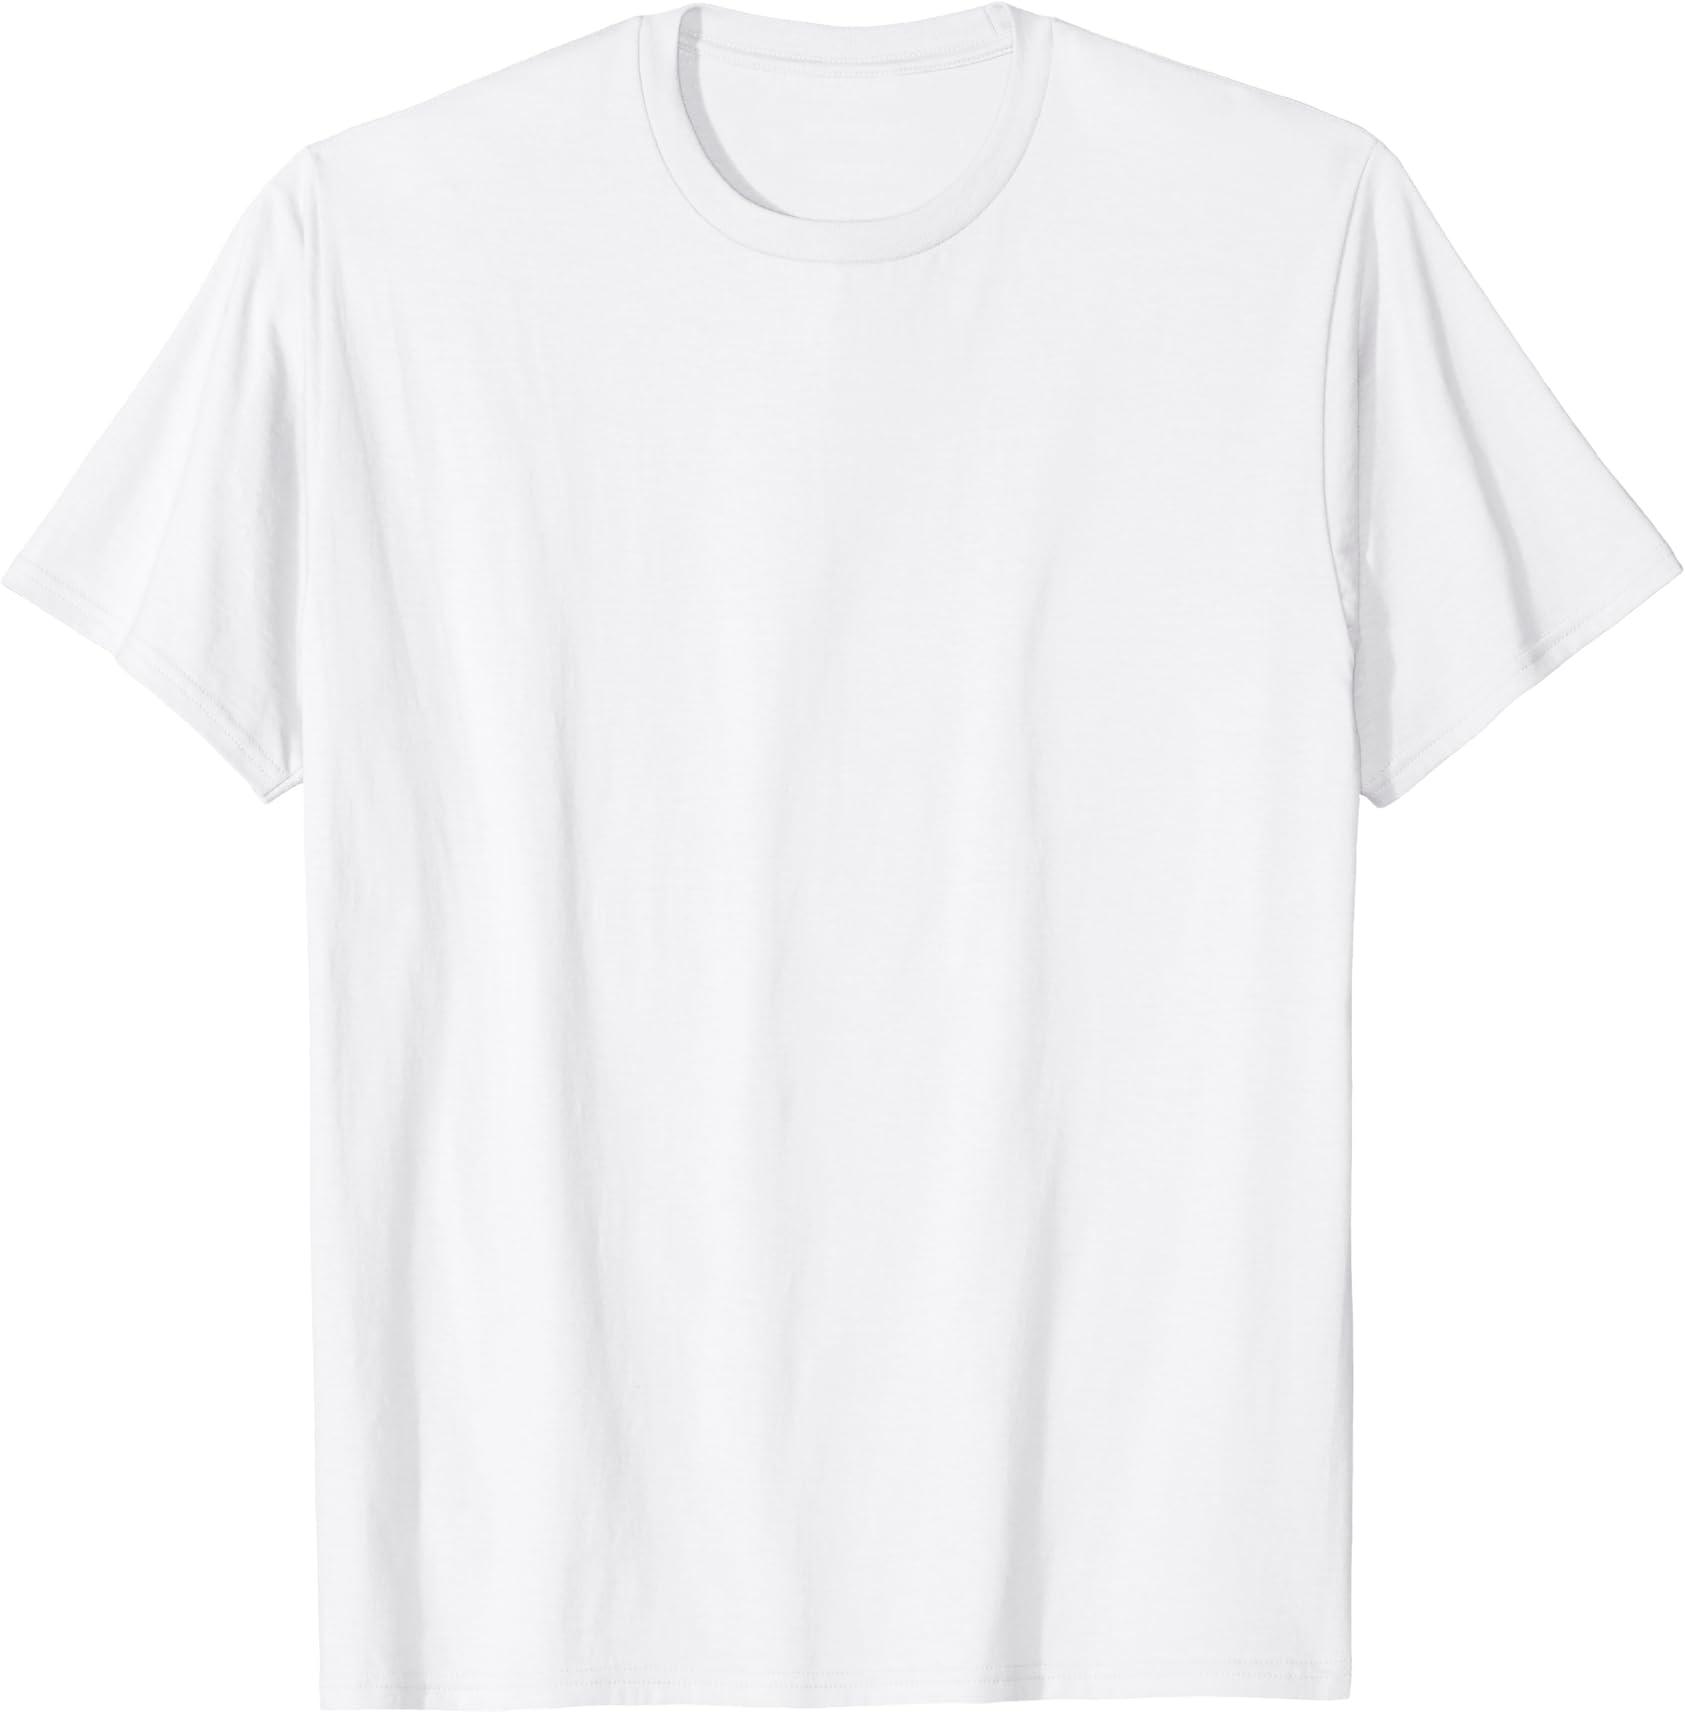 New SINGER SALVAGE YARD CAR Men/'s Black T-Shirt Size S M L XL 2XL 3XL